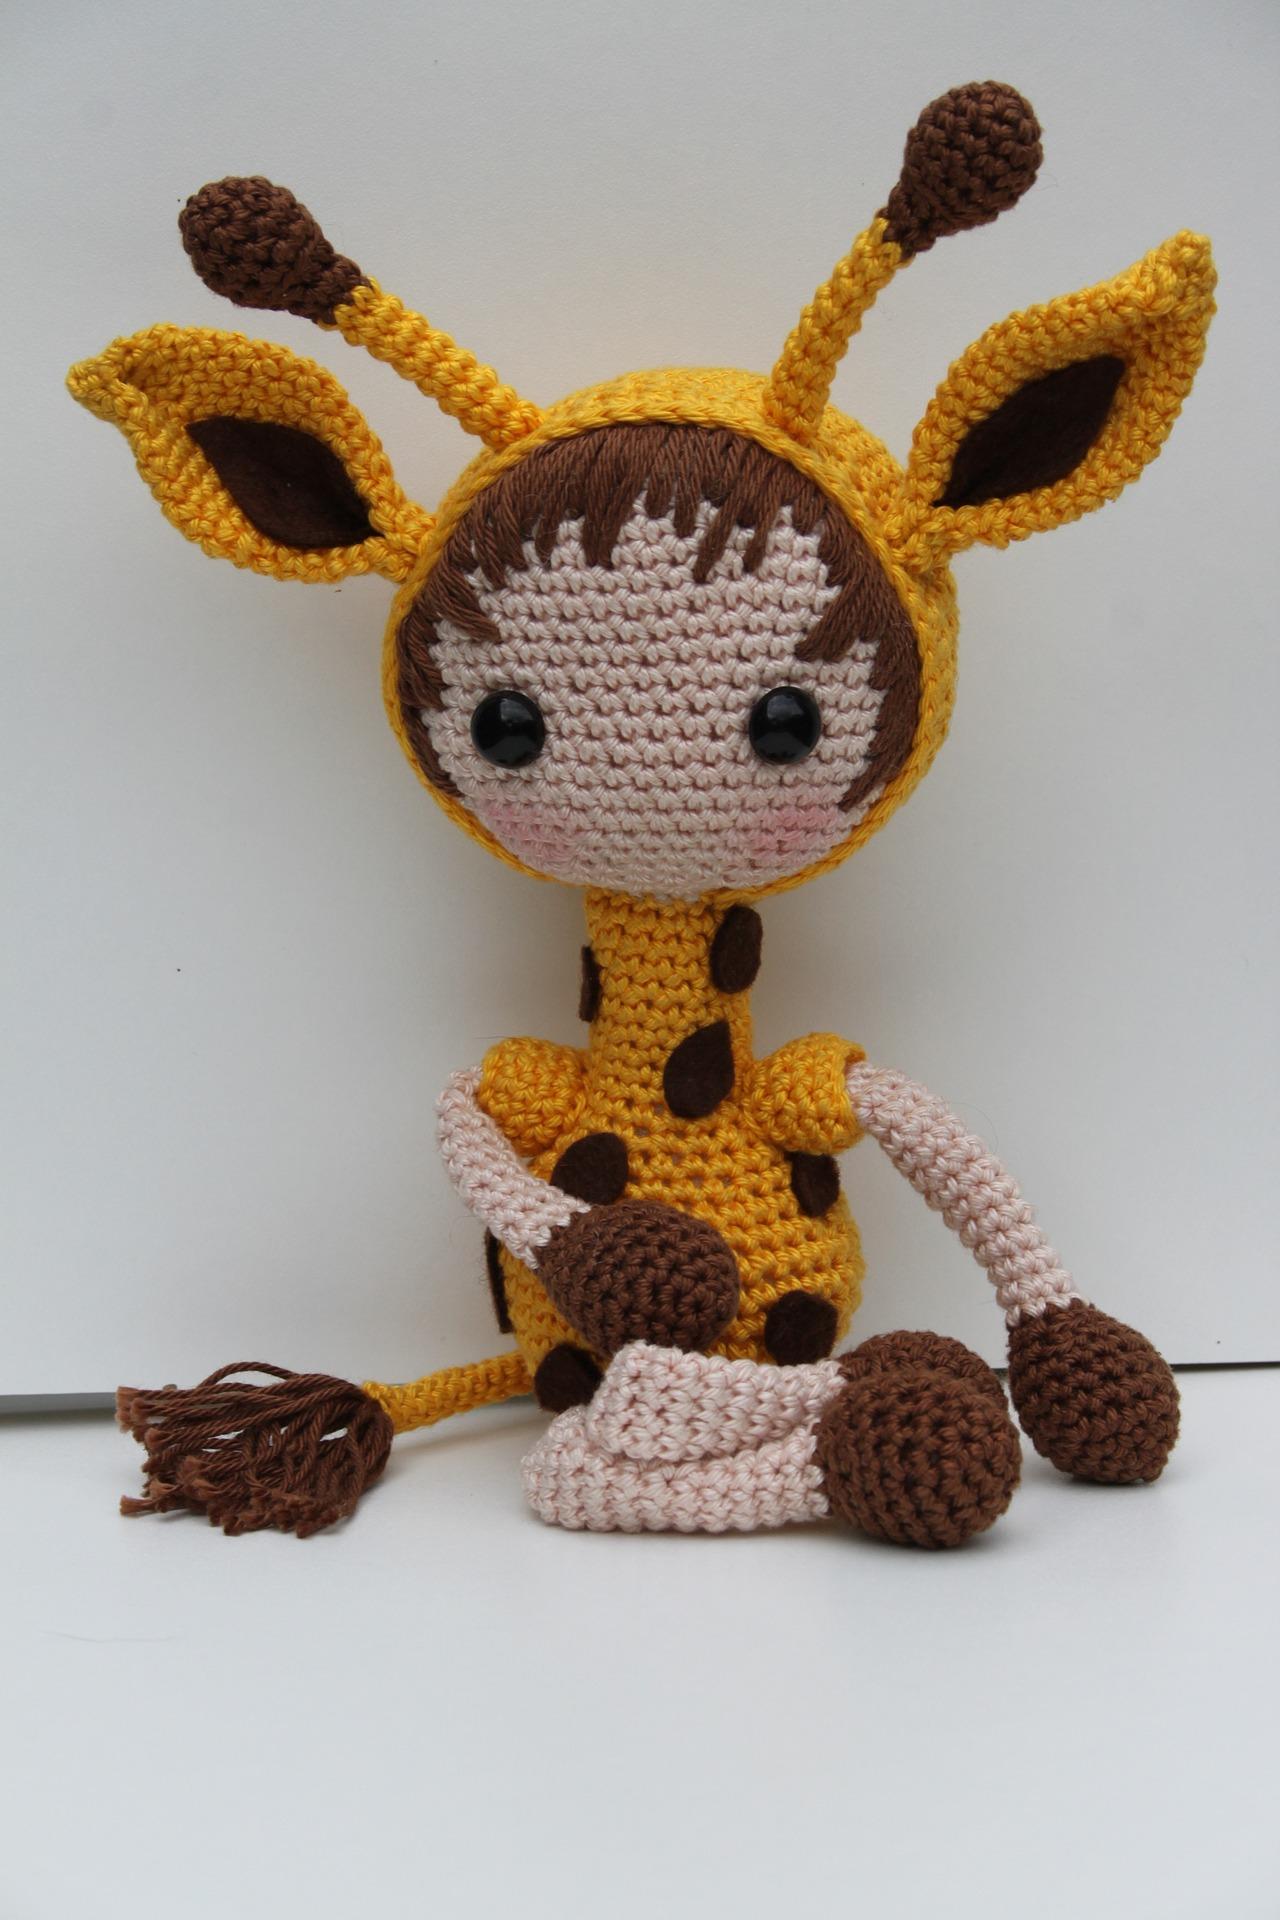 giraffe-1662561_1920